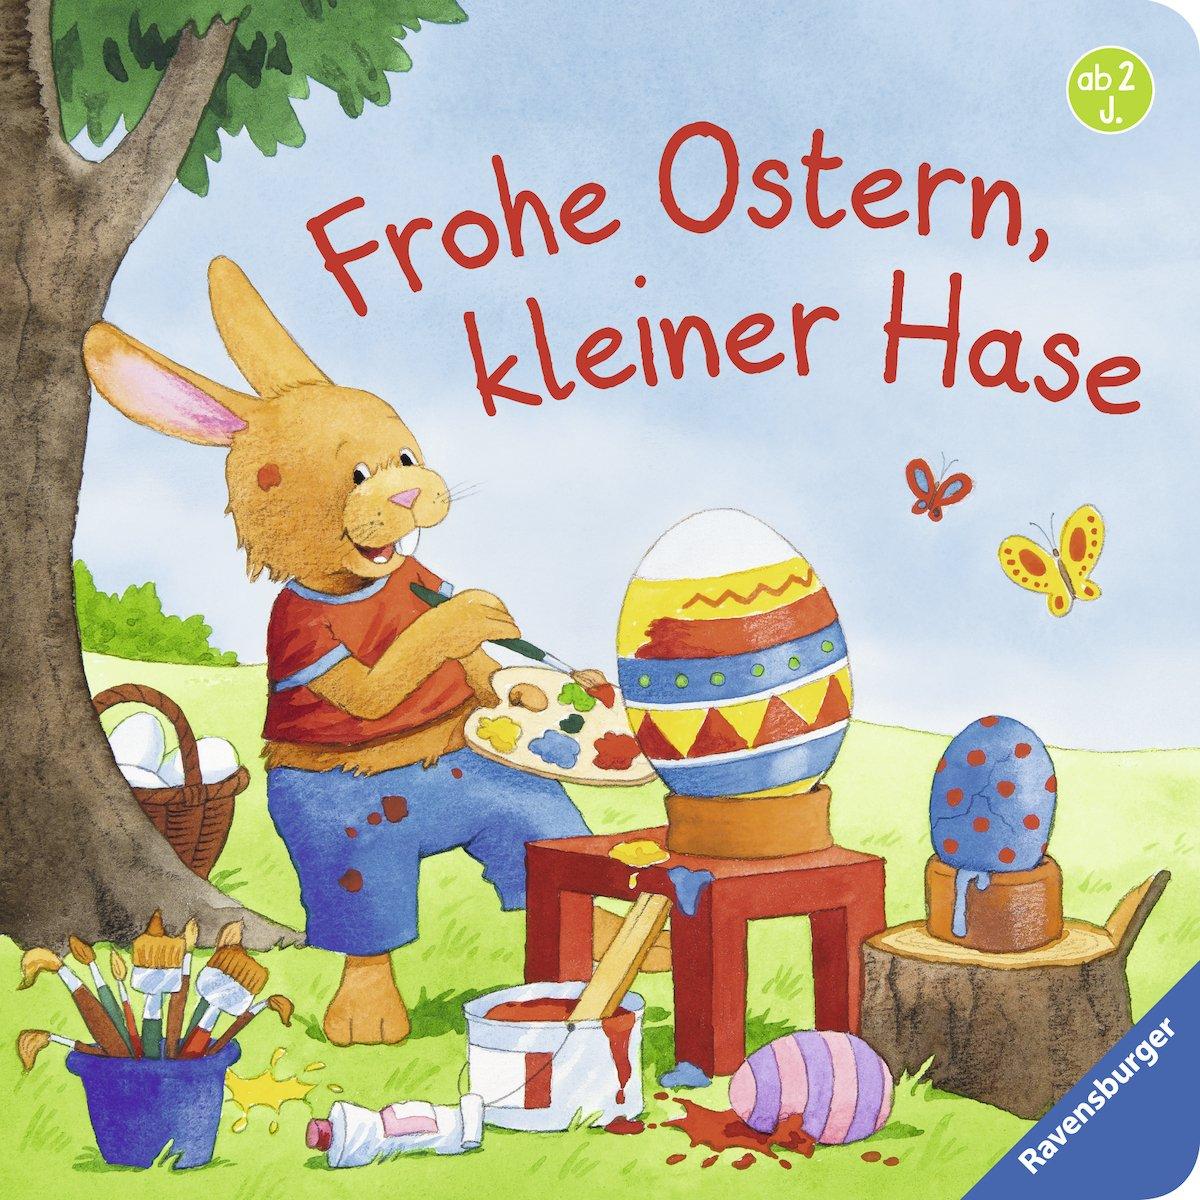 Frohe Ostern, kleiner Hase: Amazon.de: Sandra Grimm, Kerstin M ...